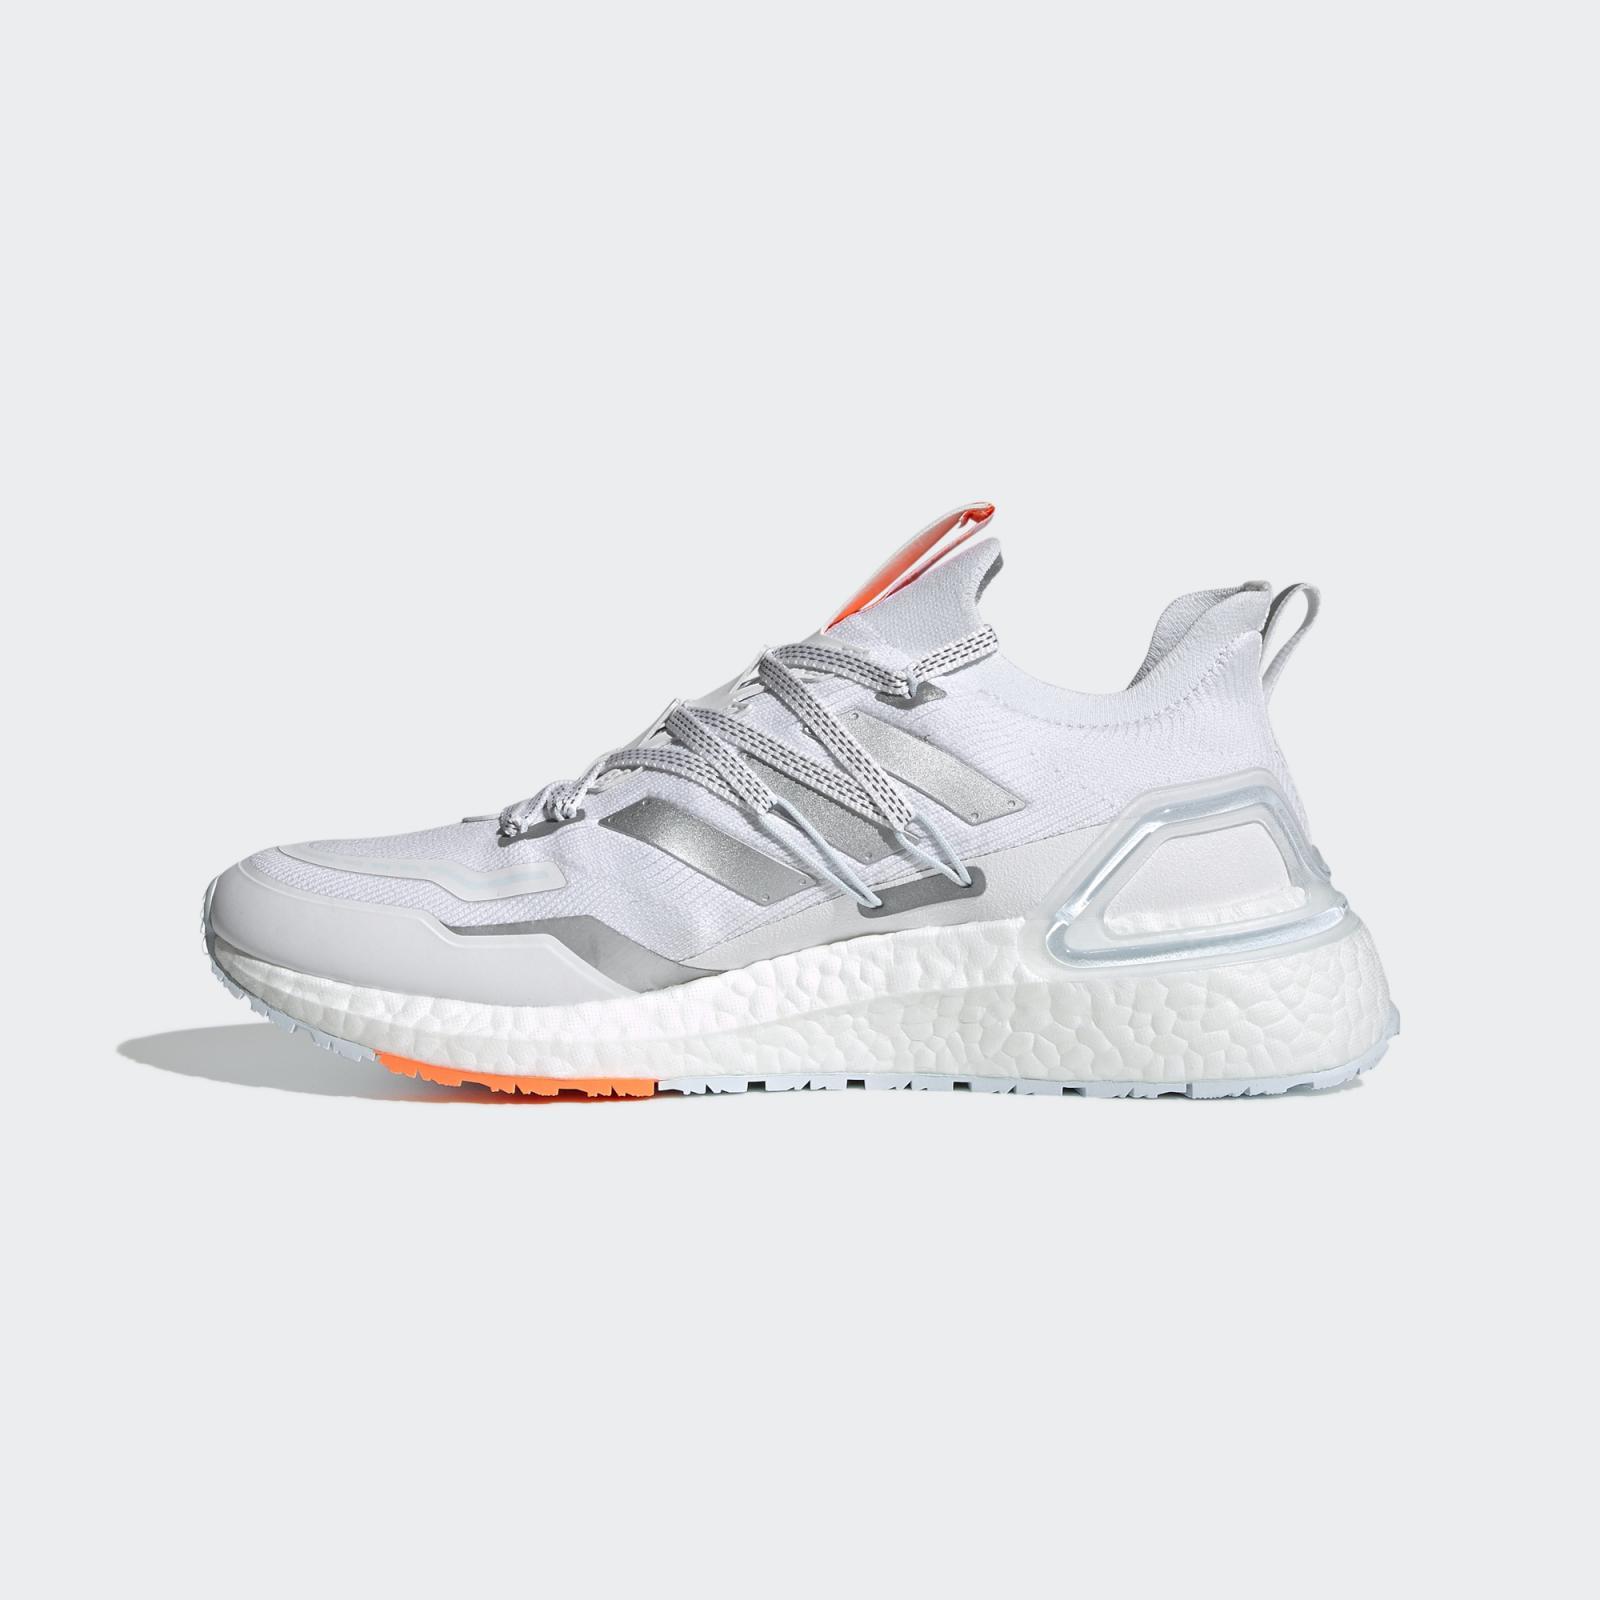 adidas Running发布全新白/银/浅天蓝色UltraBOOST 20 Lab